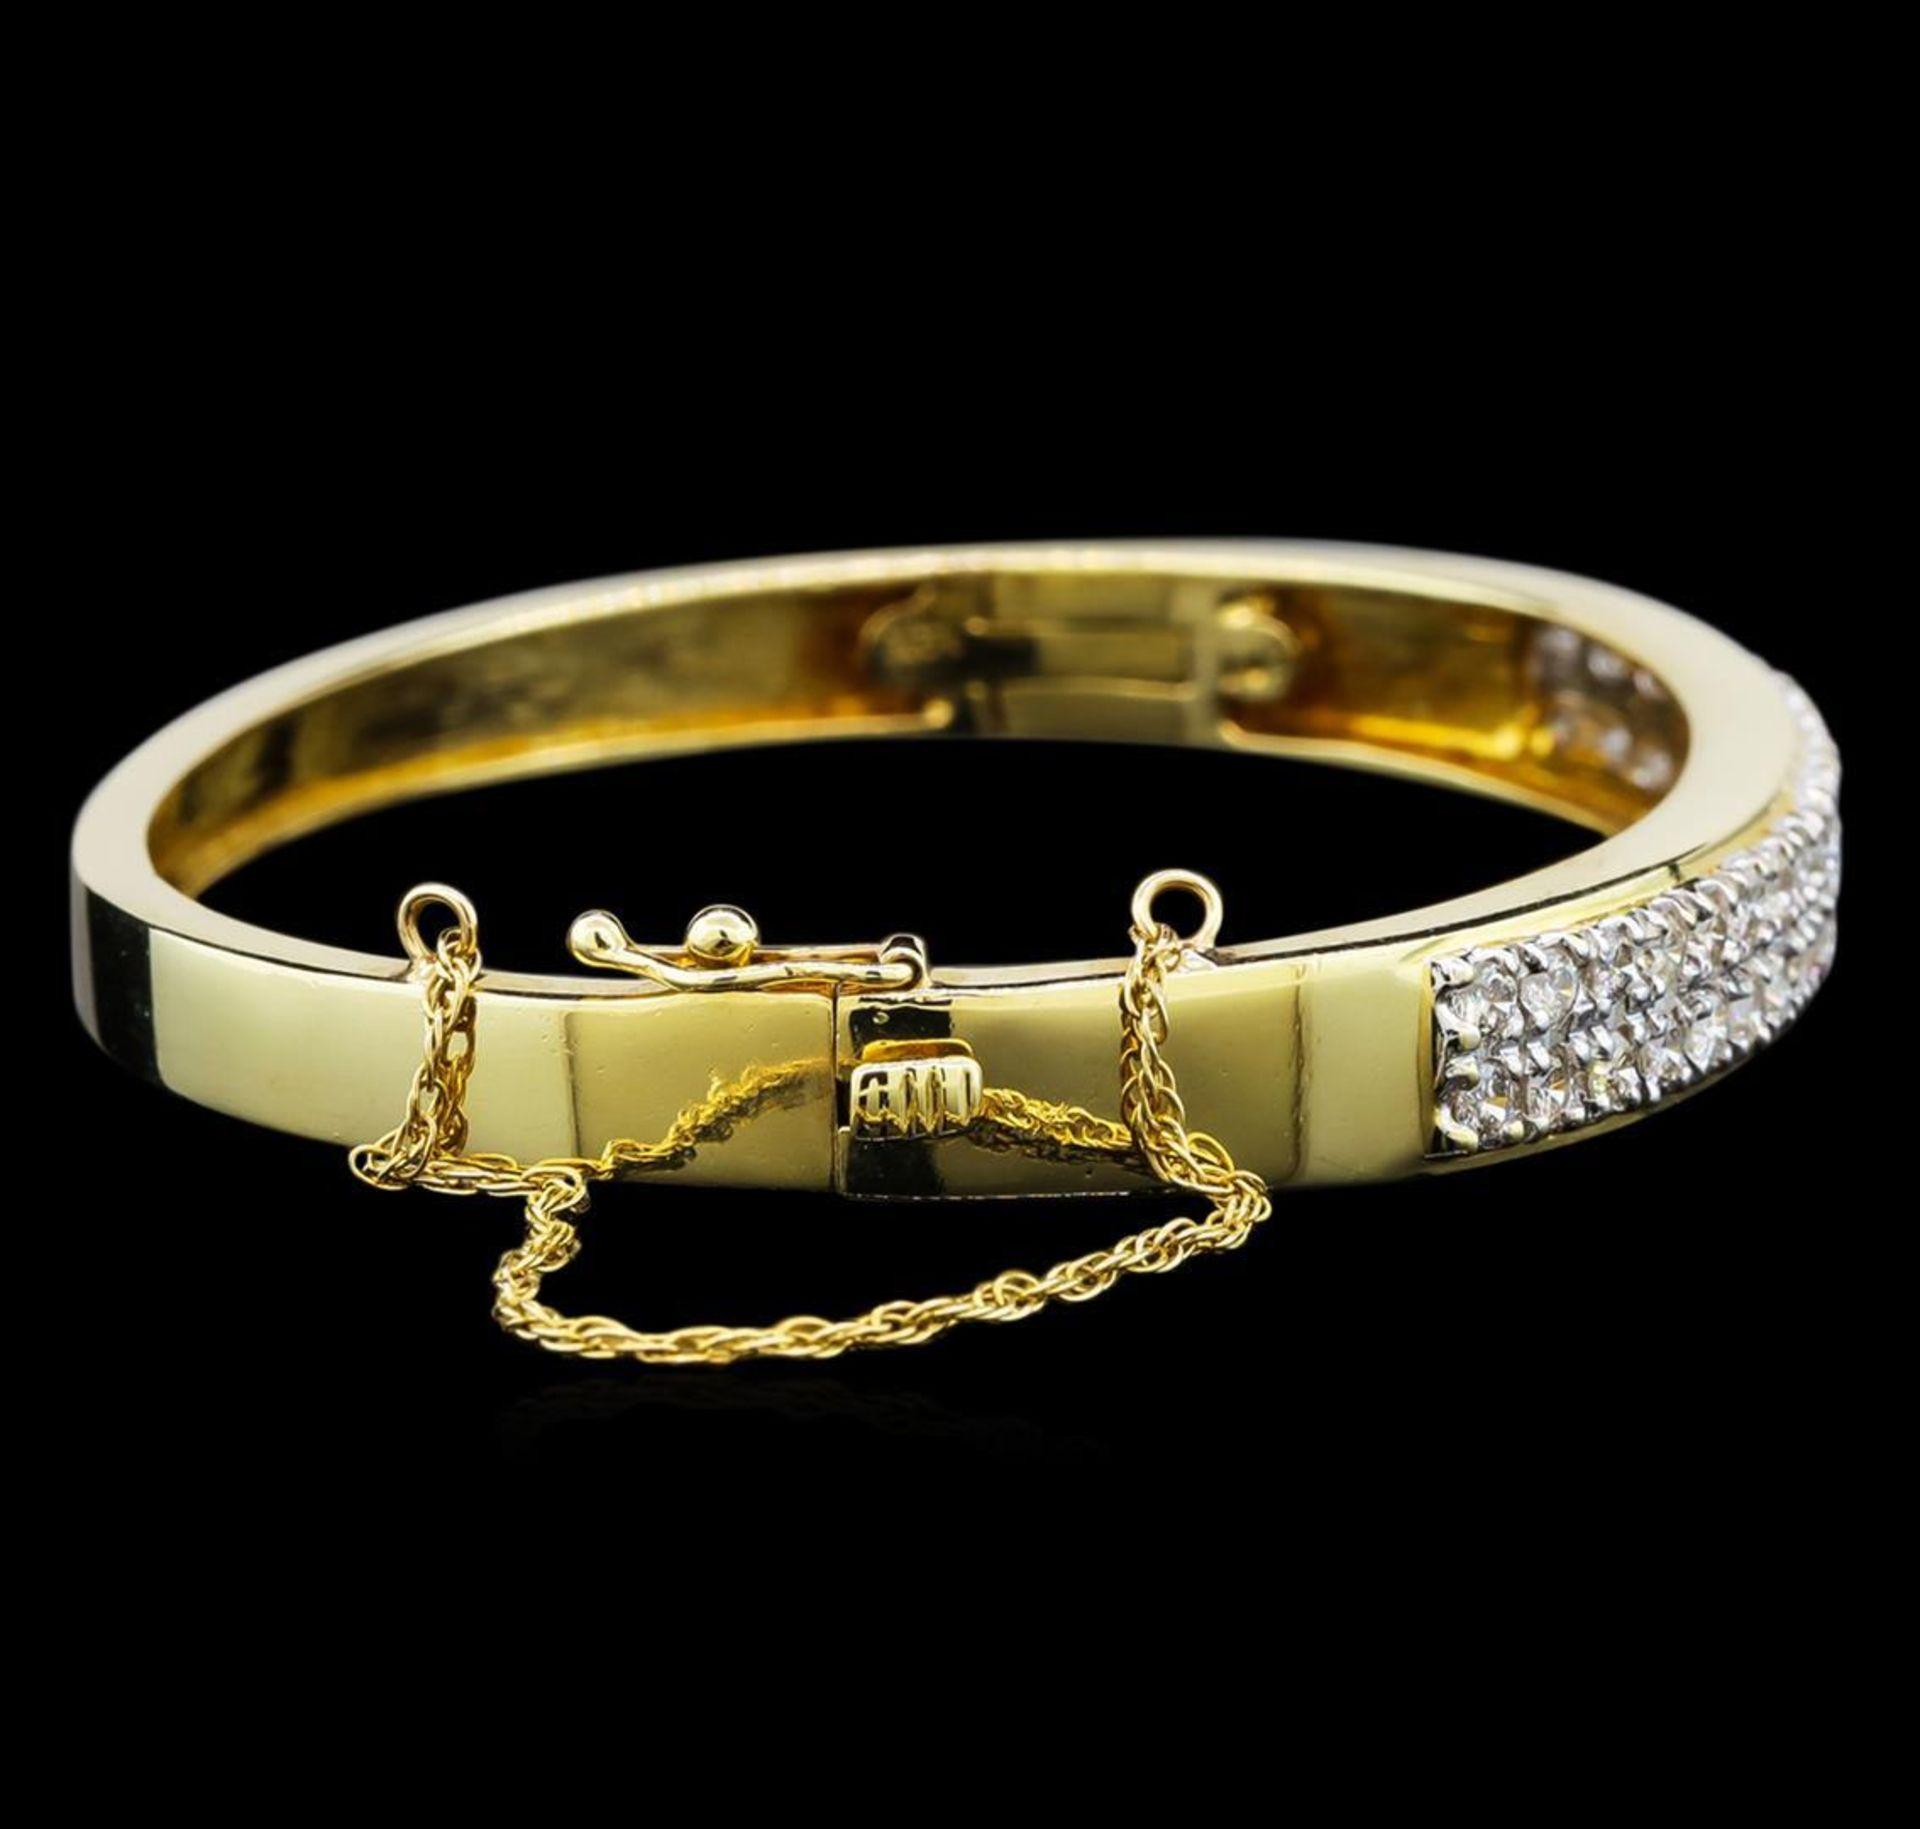 14KT Yellow Gold 2.28 ctw Diamond Bracelet - Image 2 of 4